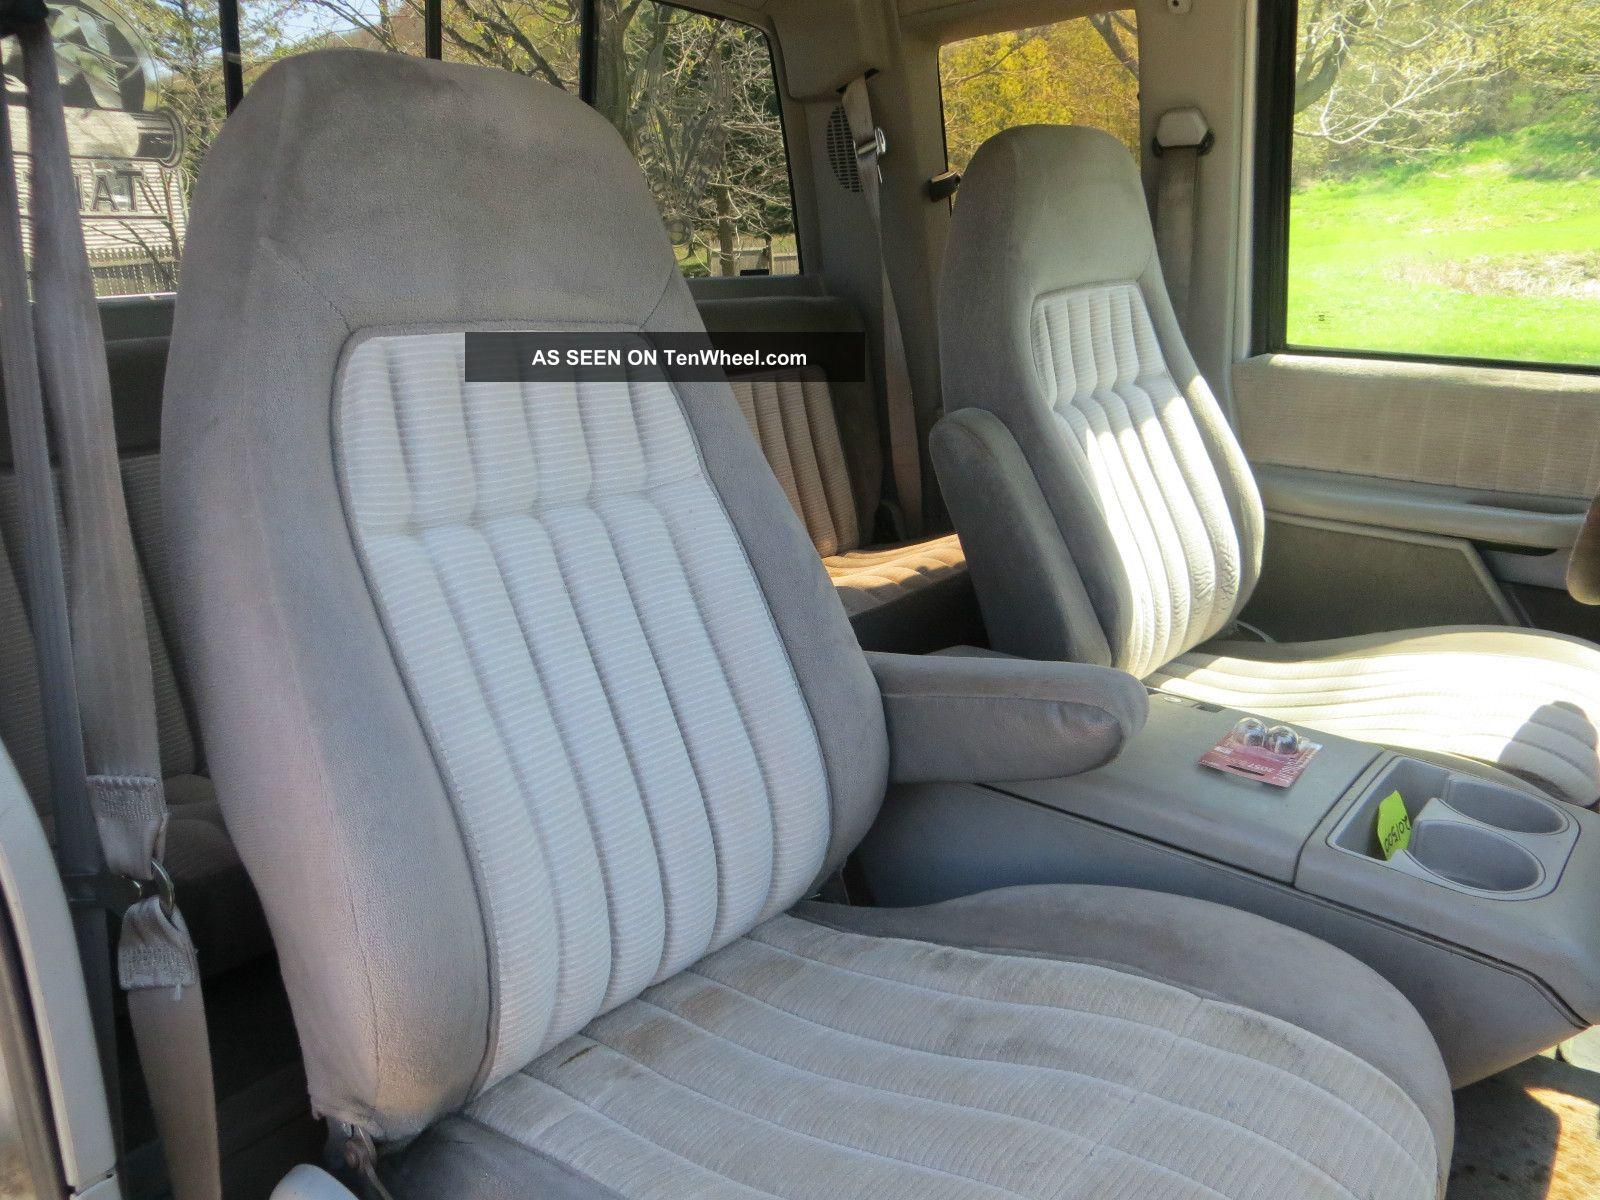 1993 Chevy Silverado 2500 4x4